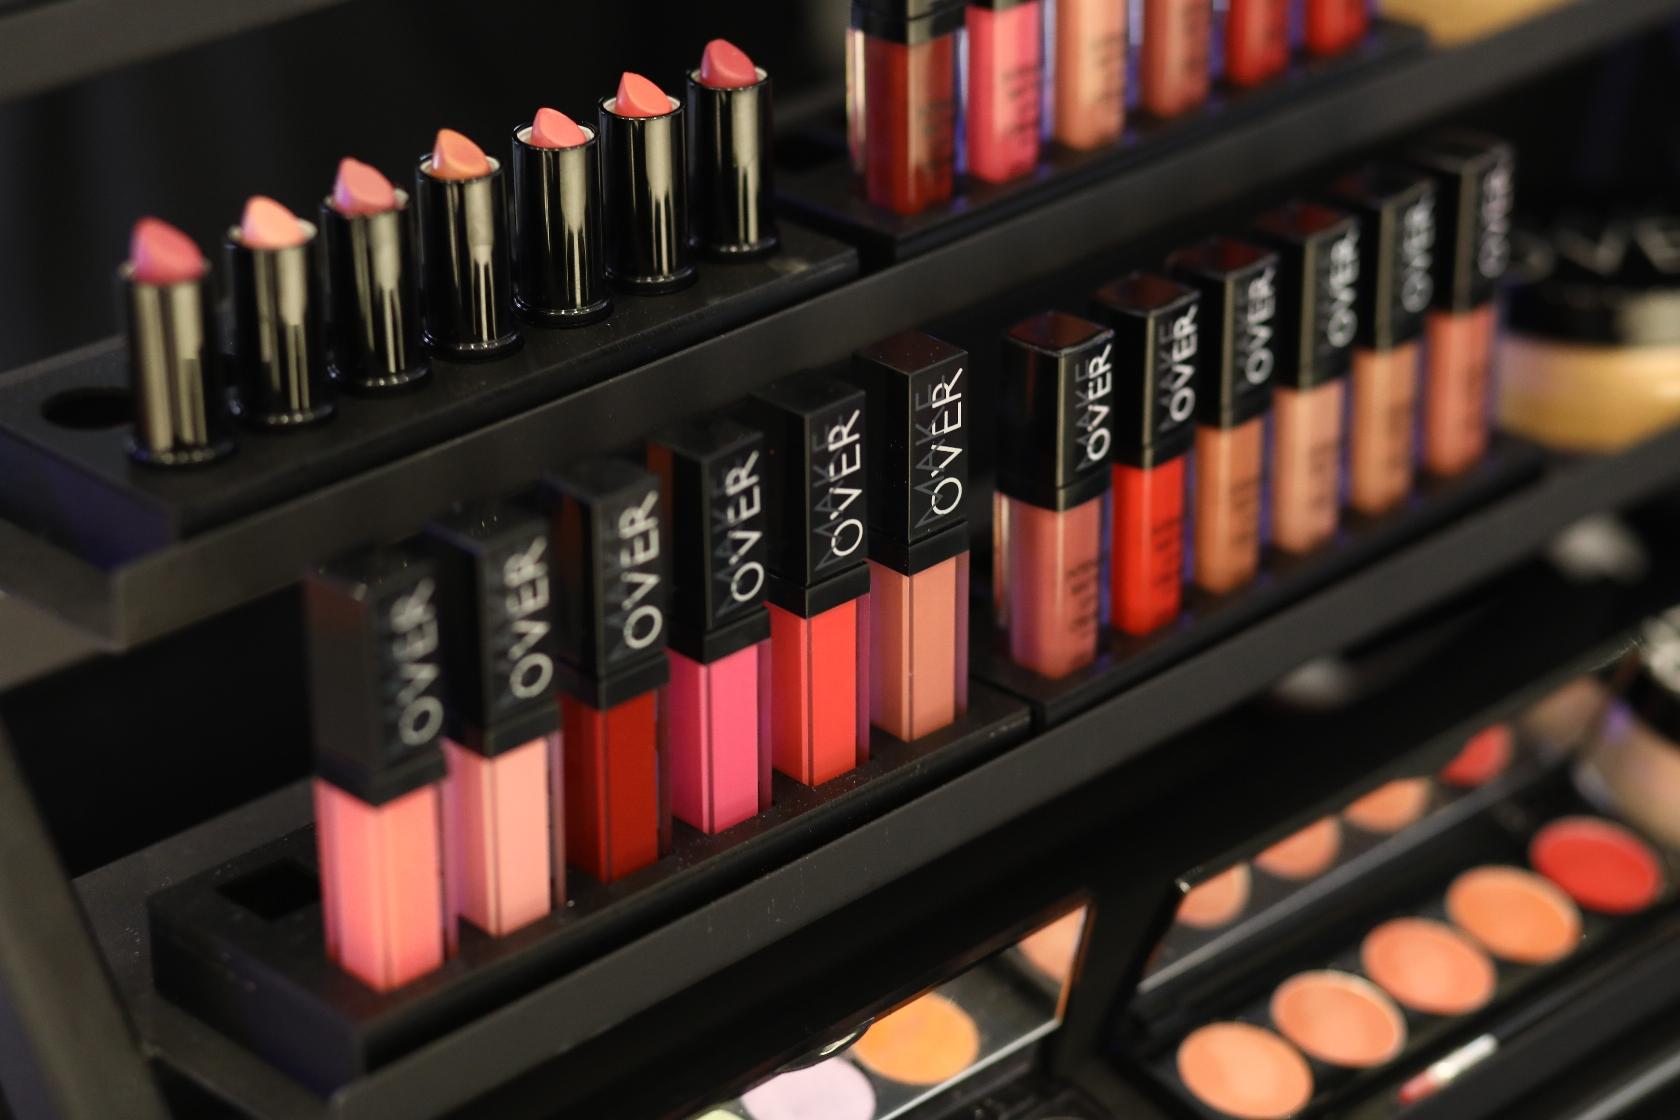 21 Warna Baru Lipstick Dan Lip Cream Make Over Female Daily Makeover Intense Matte Lipstik